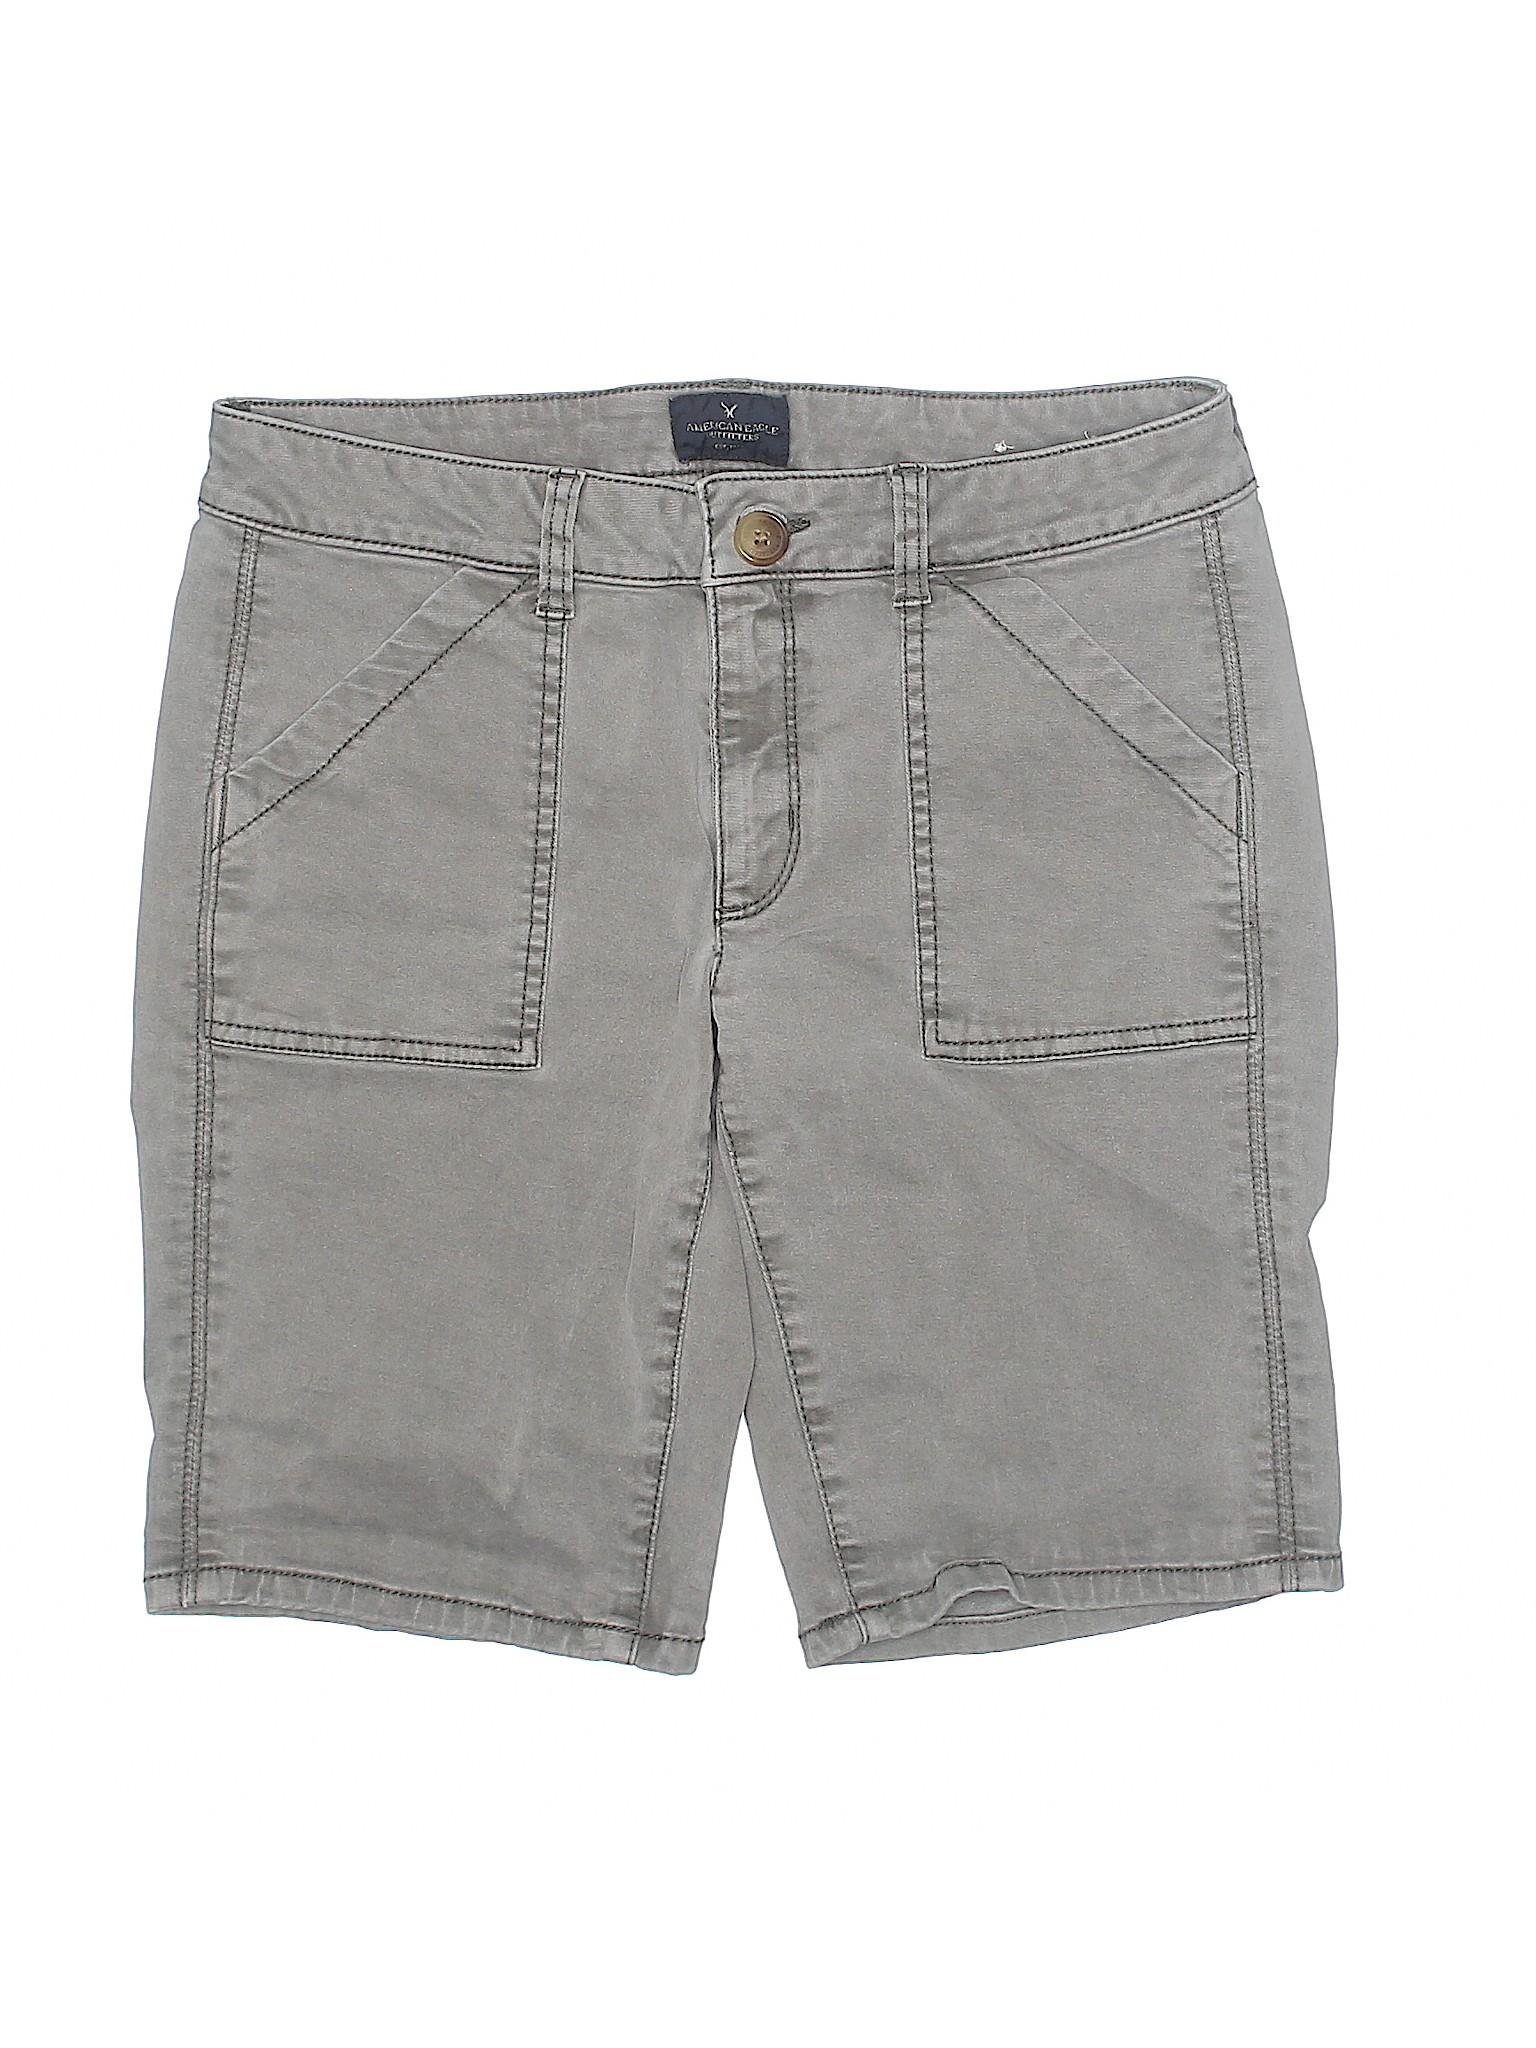 Outfitters Khaki American winter Shorts Boutique Eagle Swq8tt